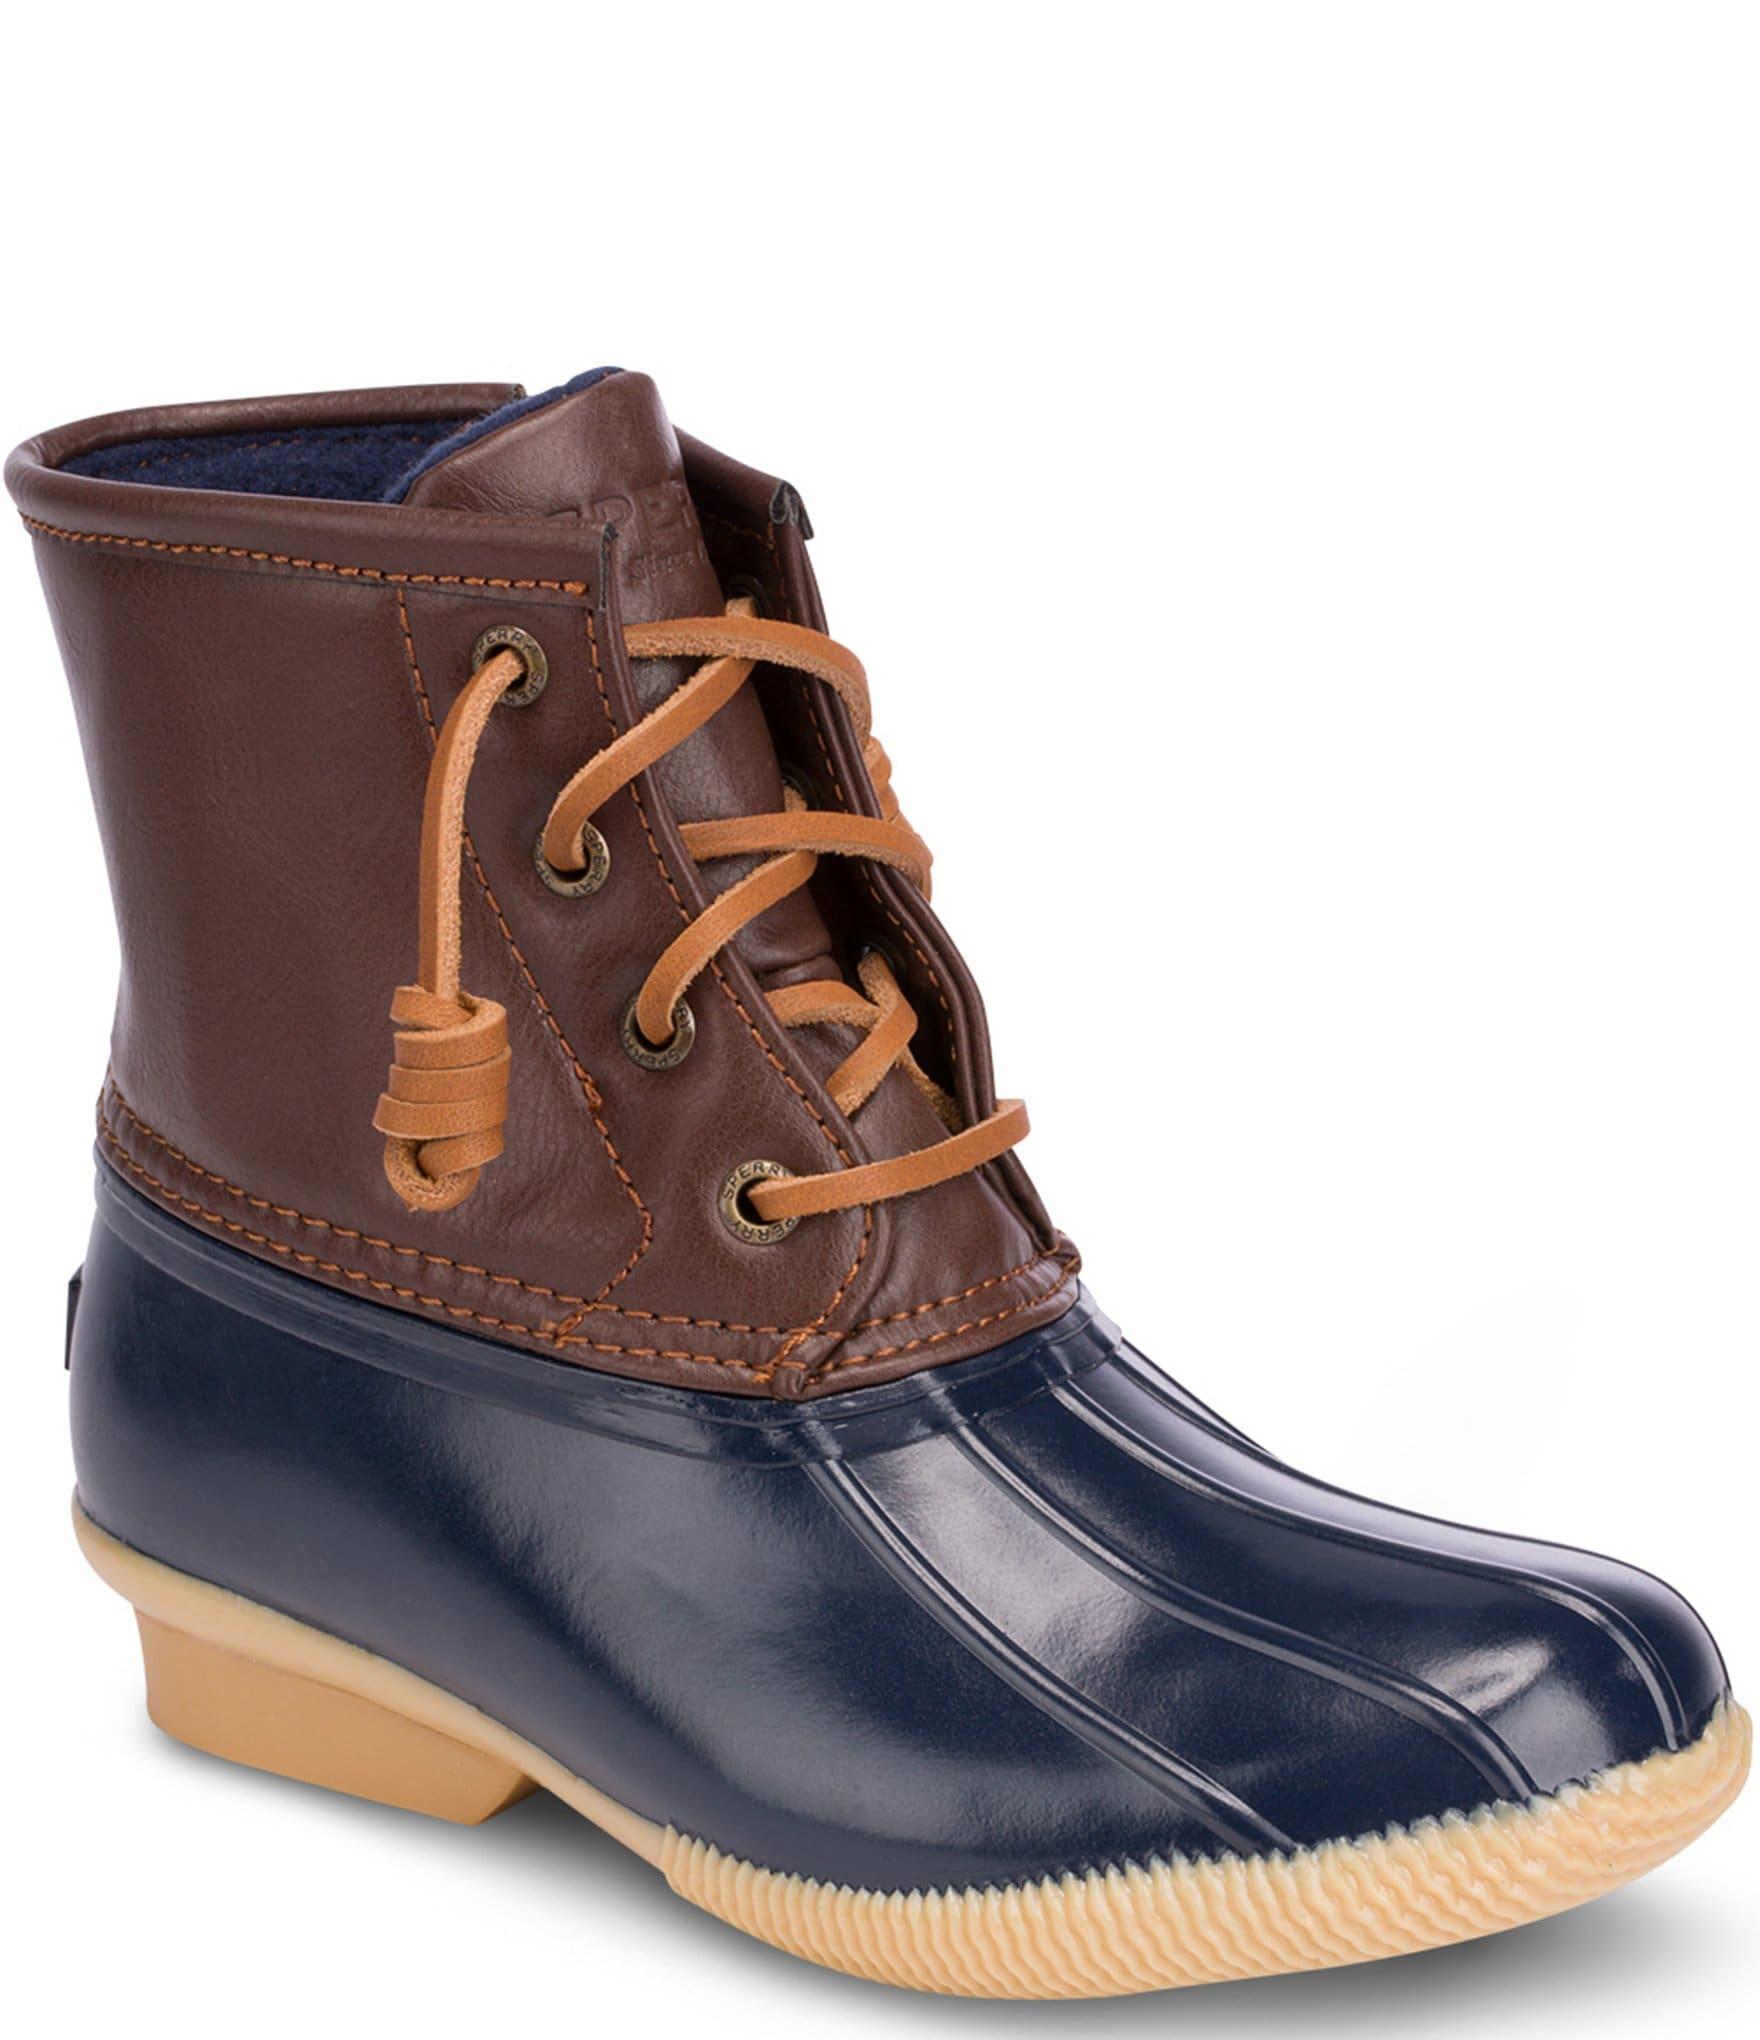 ac0be33476e8 Sperry Kids' Shoes | Dillard's